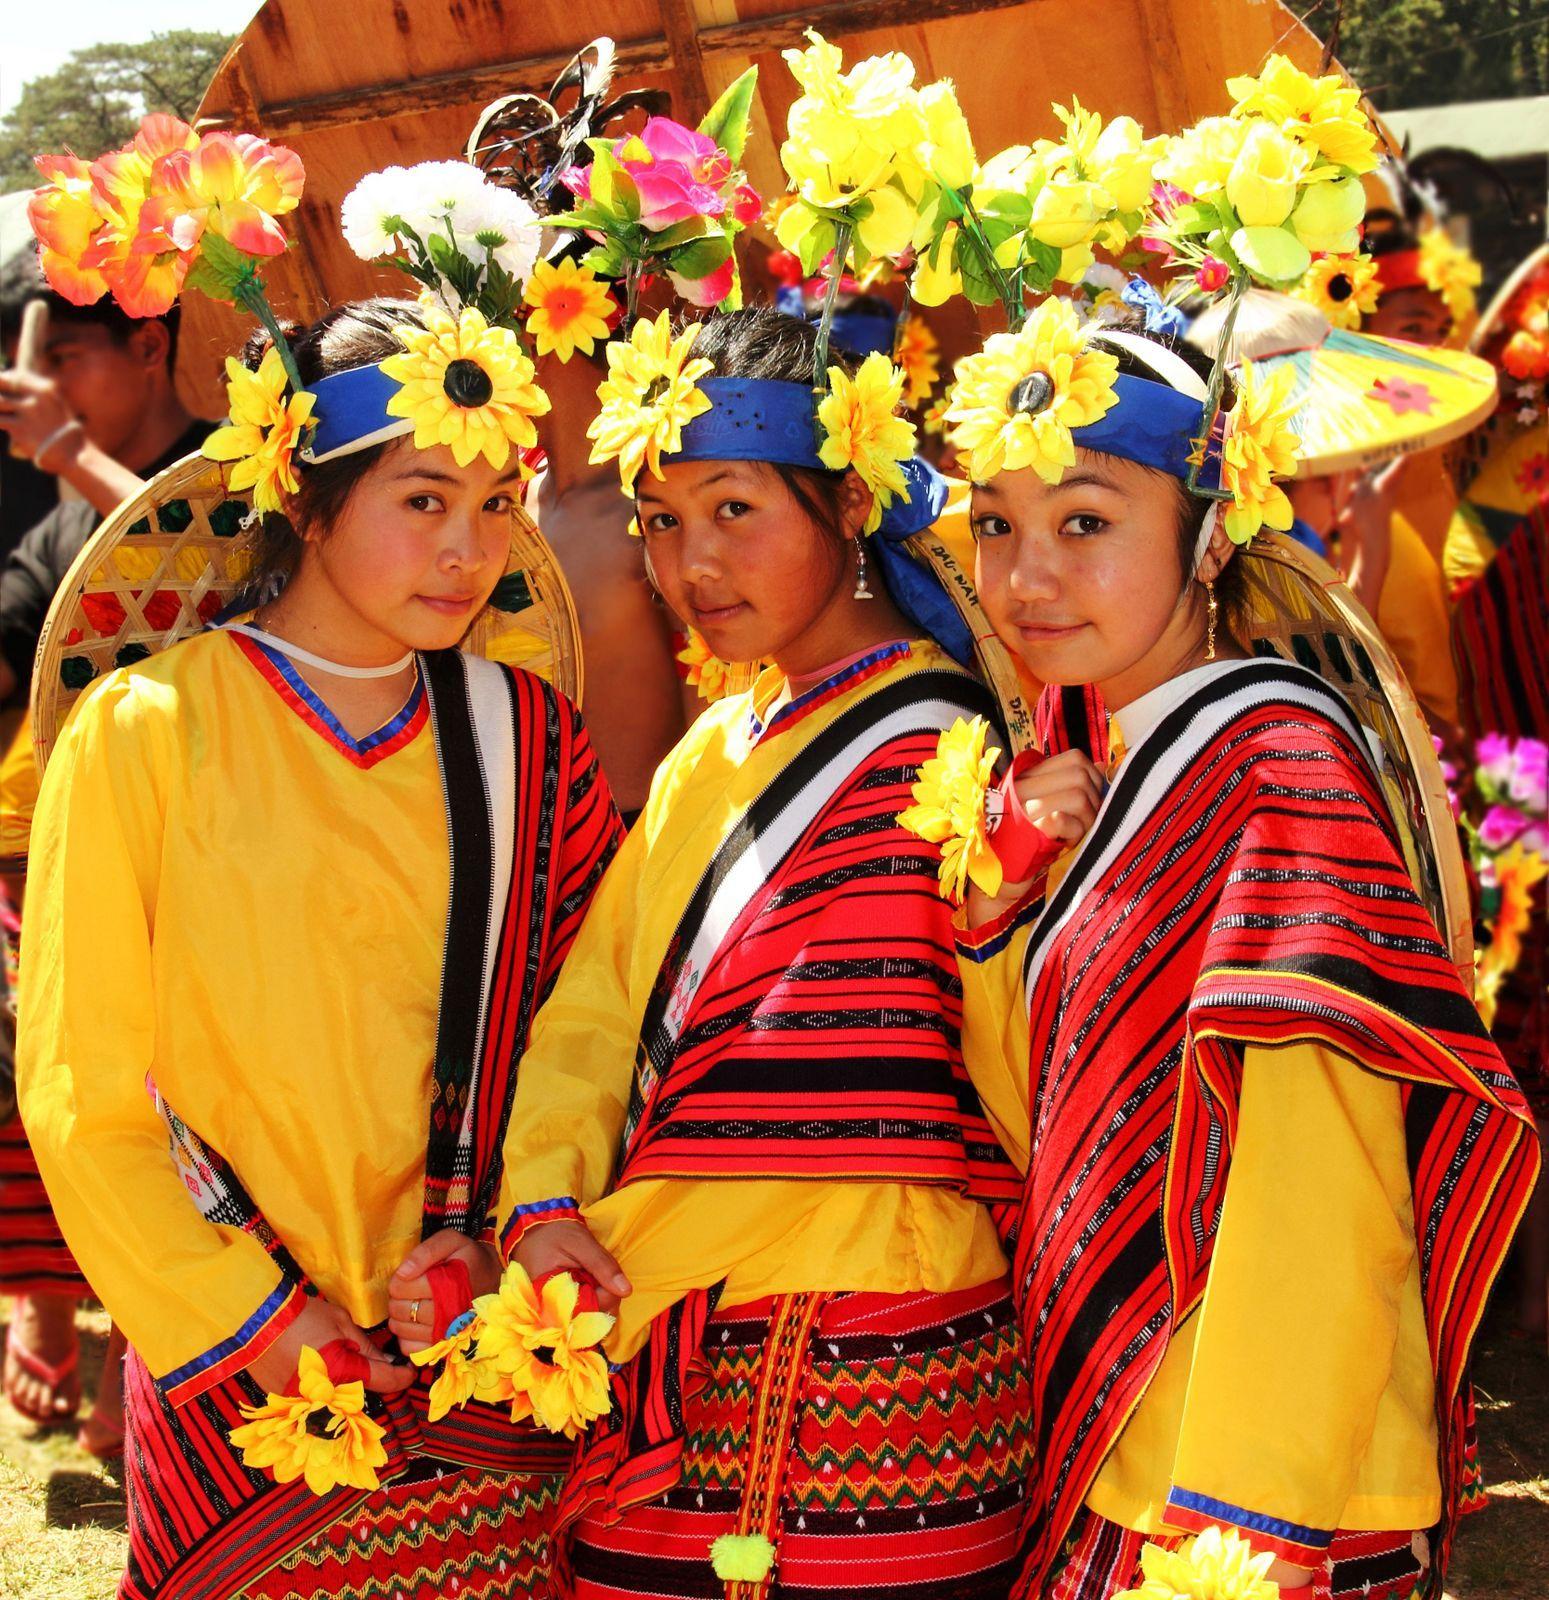 Bagiuo City, Bagiuo Flower Festival, Cordillera, Festivals